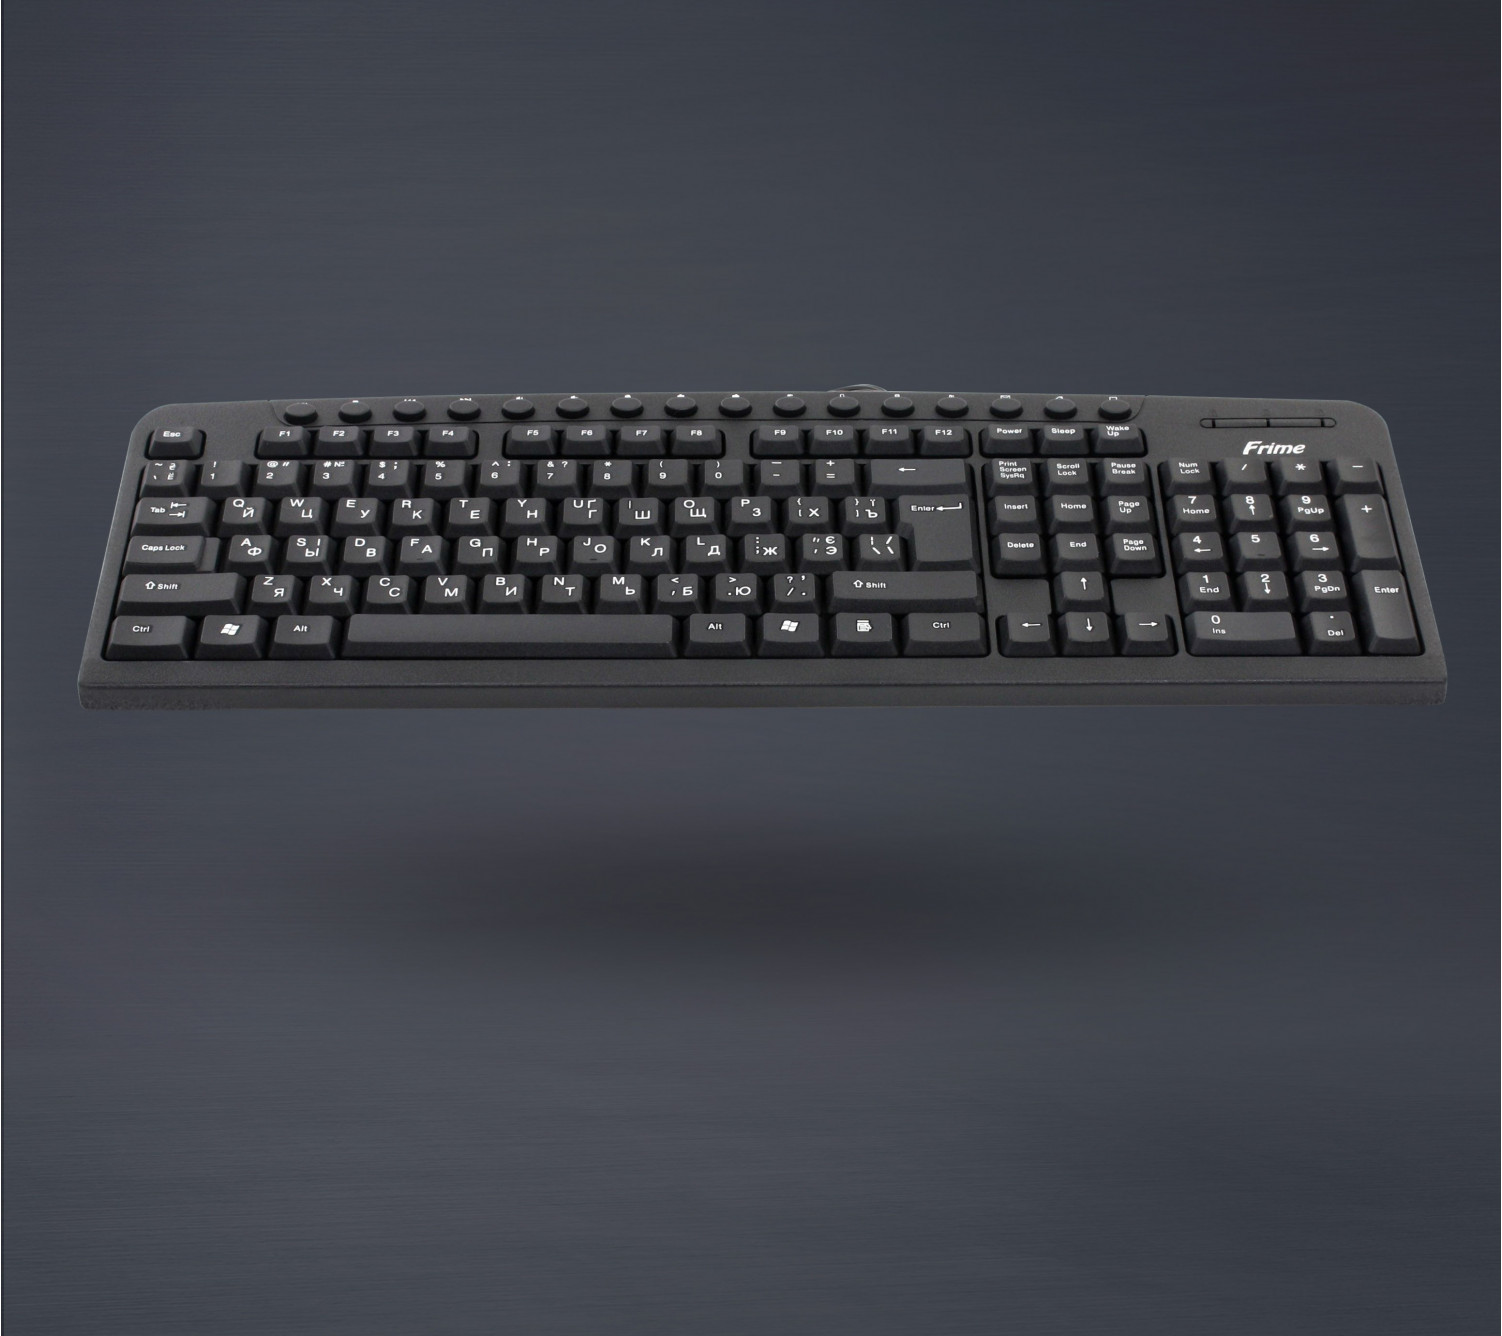 Клавиатура Frime FKBM-110 USB RUS/UKR, Black